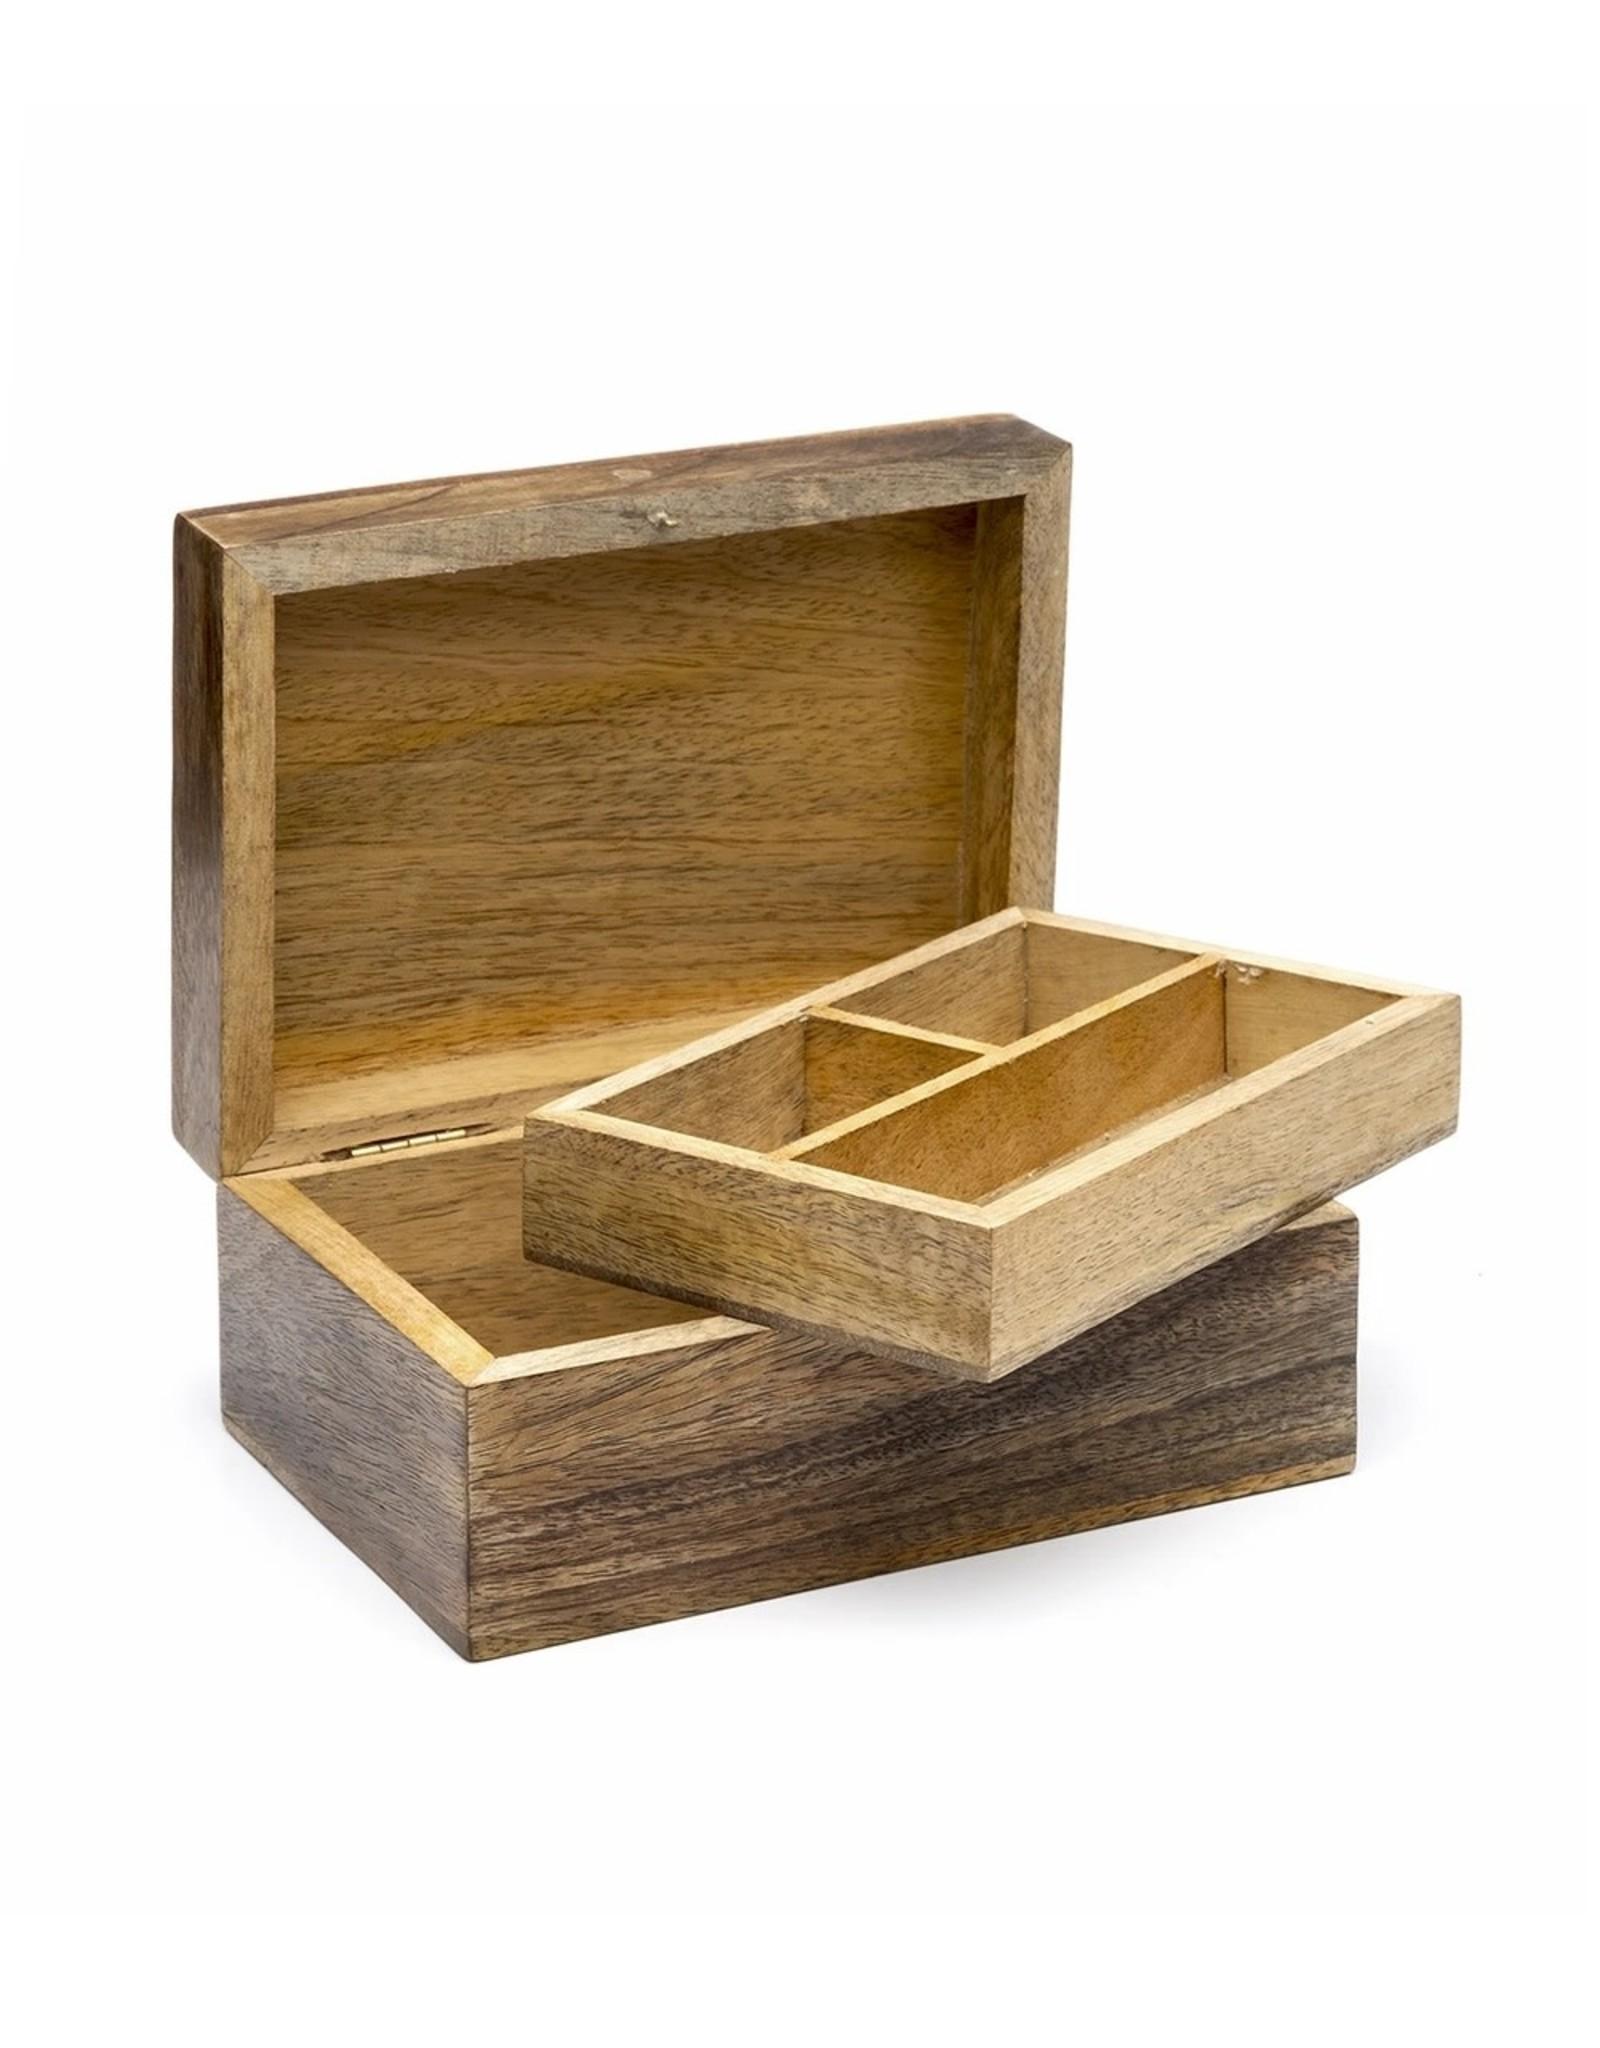 Matr Boomie Indukala Jewelry Box, India